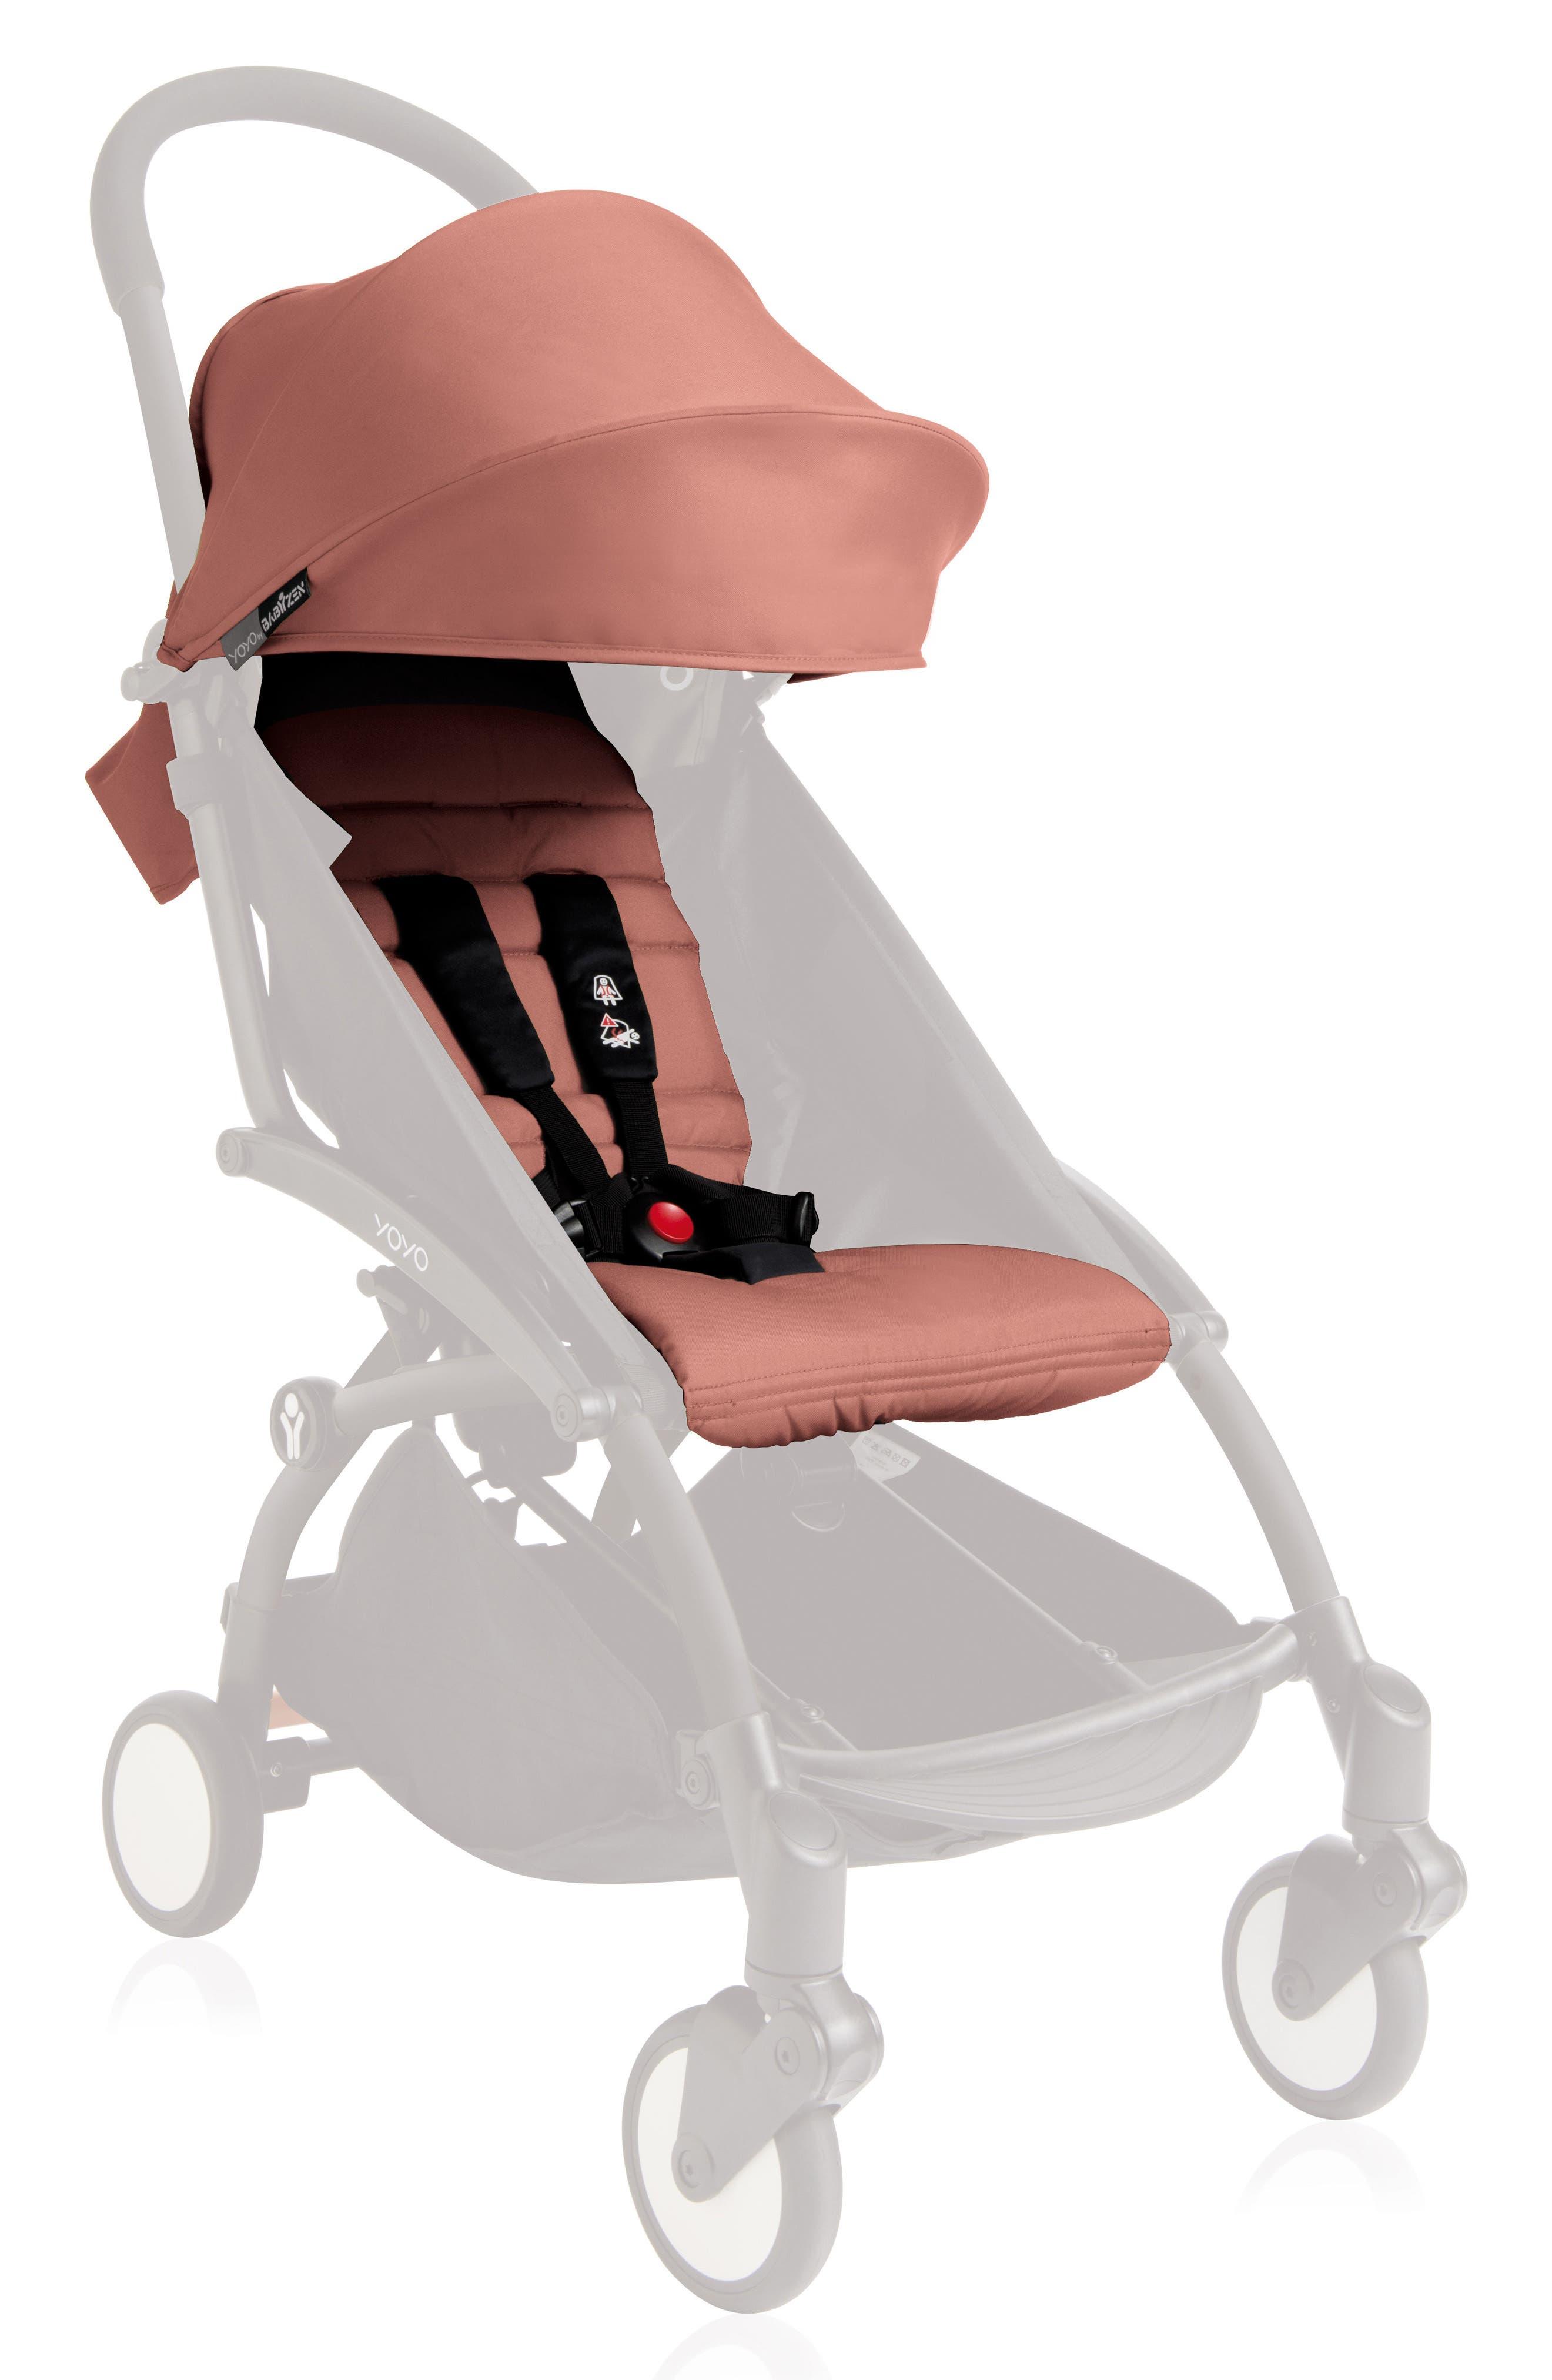 Main Image - BABYZEN YOYO+ Color Pack Seat/Fabric Set for BABYZEN YOYO+ Stroller Frame